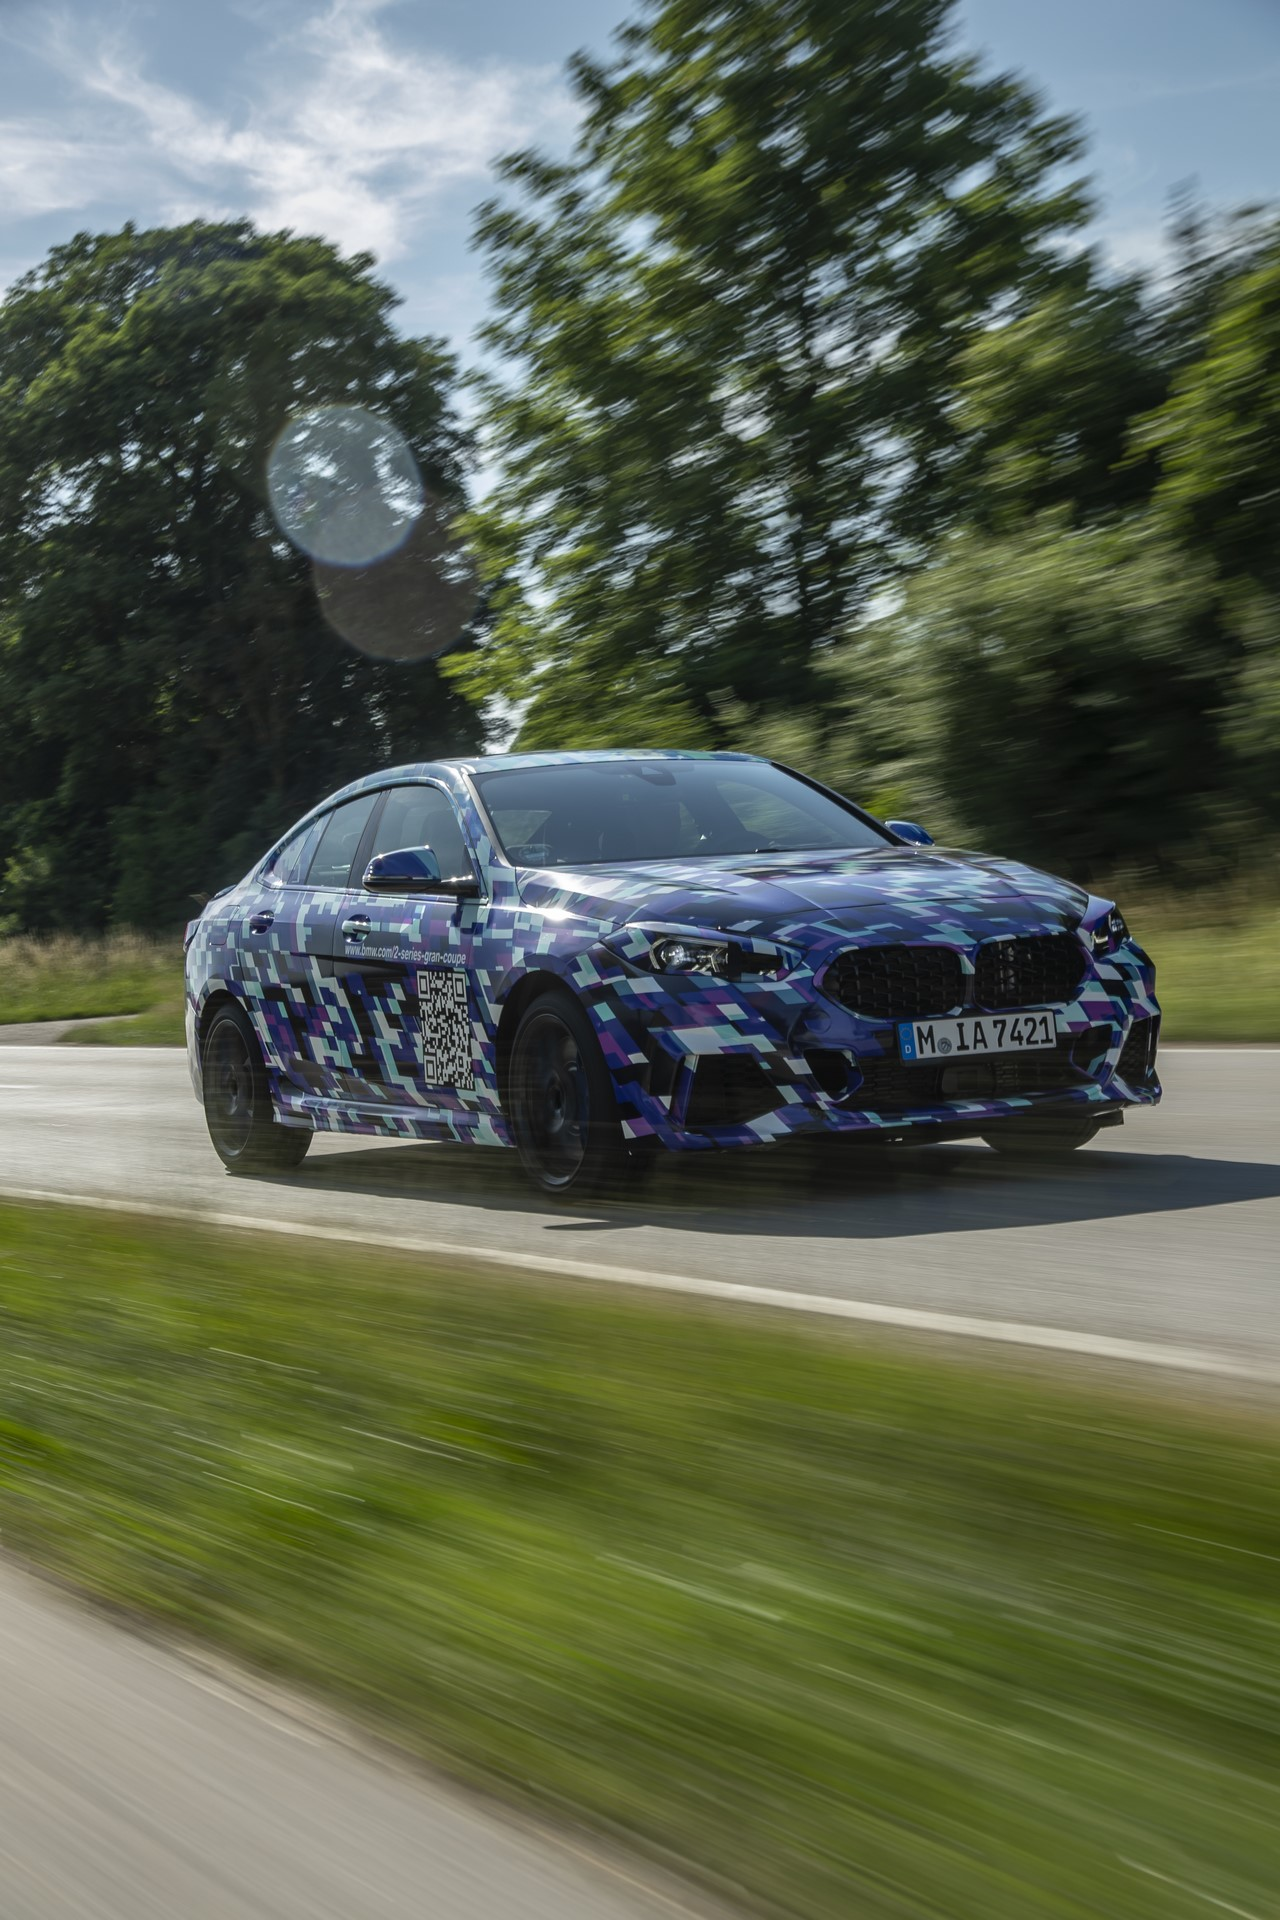 BMW-2-Series-Gran-Coupe-2020-spy-photos-29